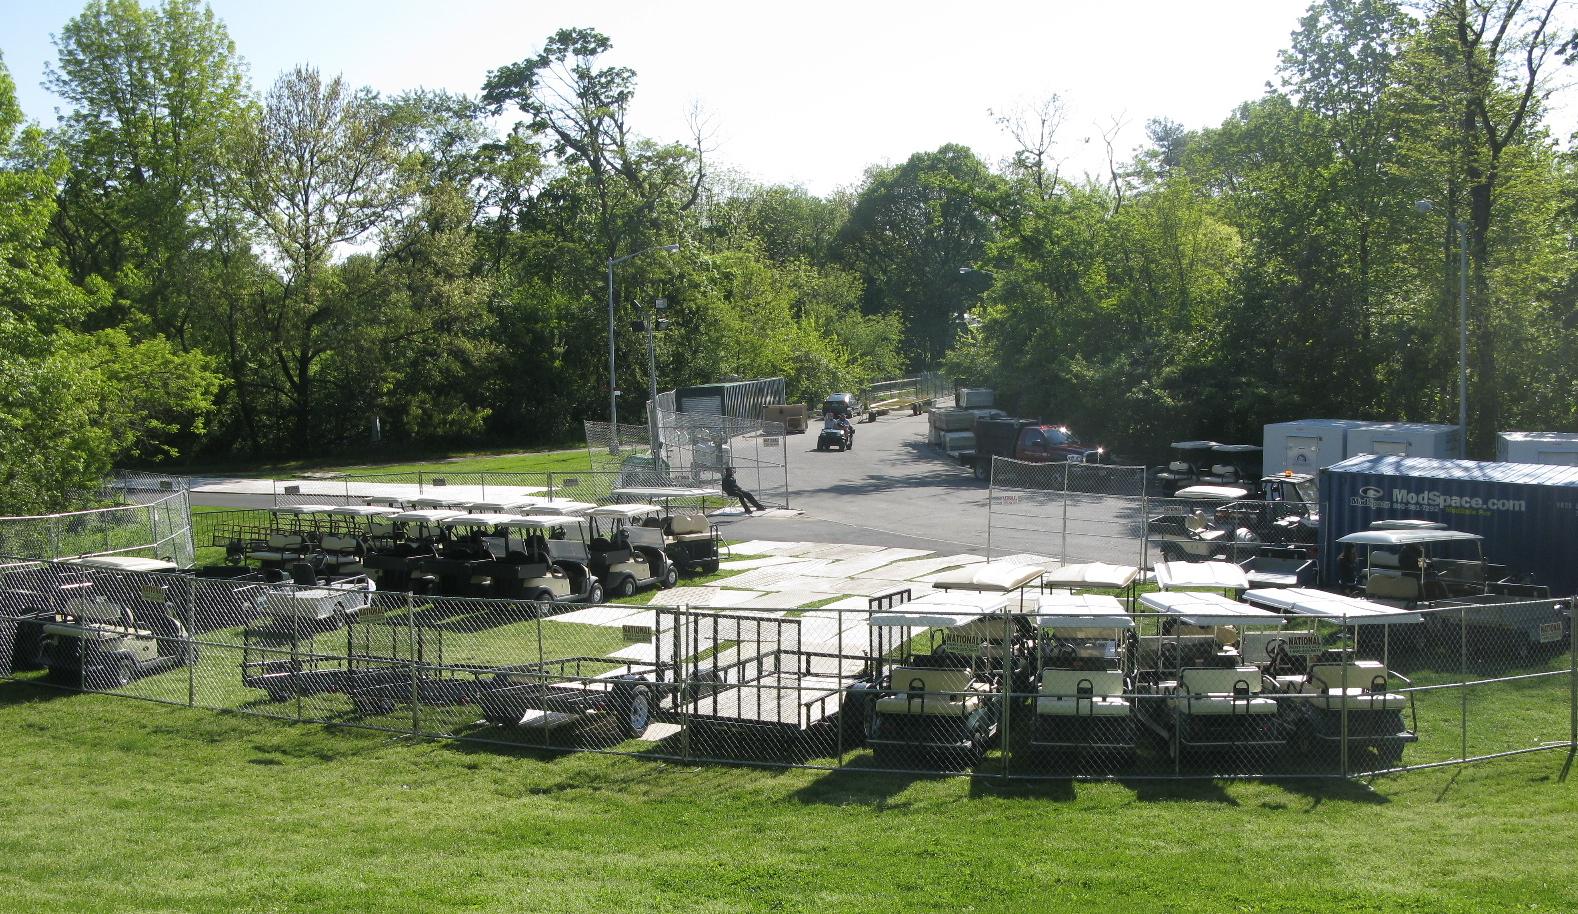 prospect park backyard and beyond page 9